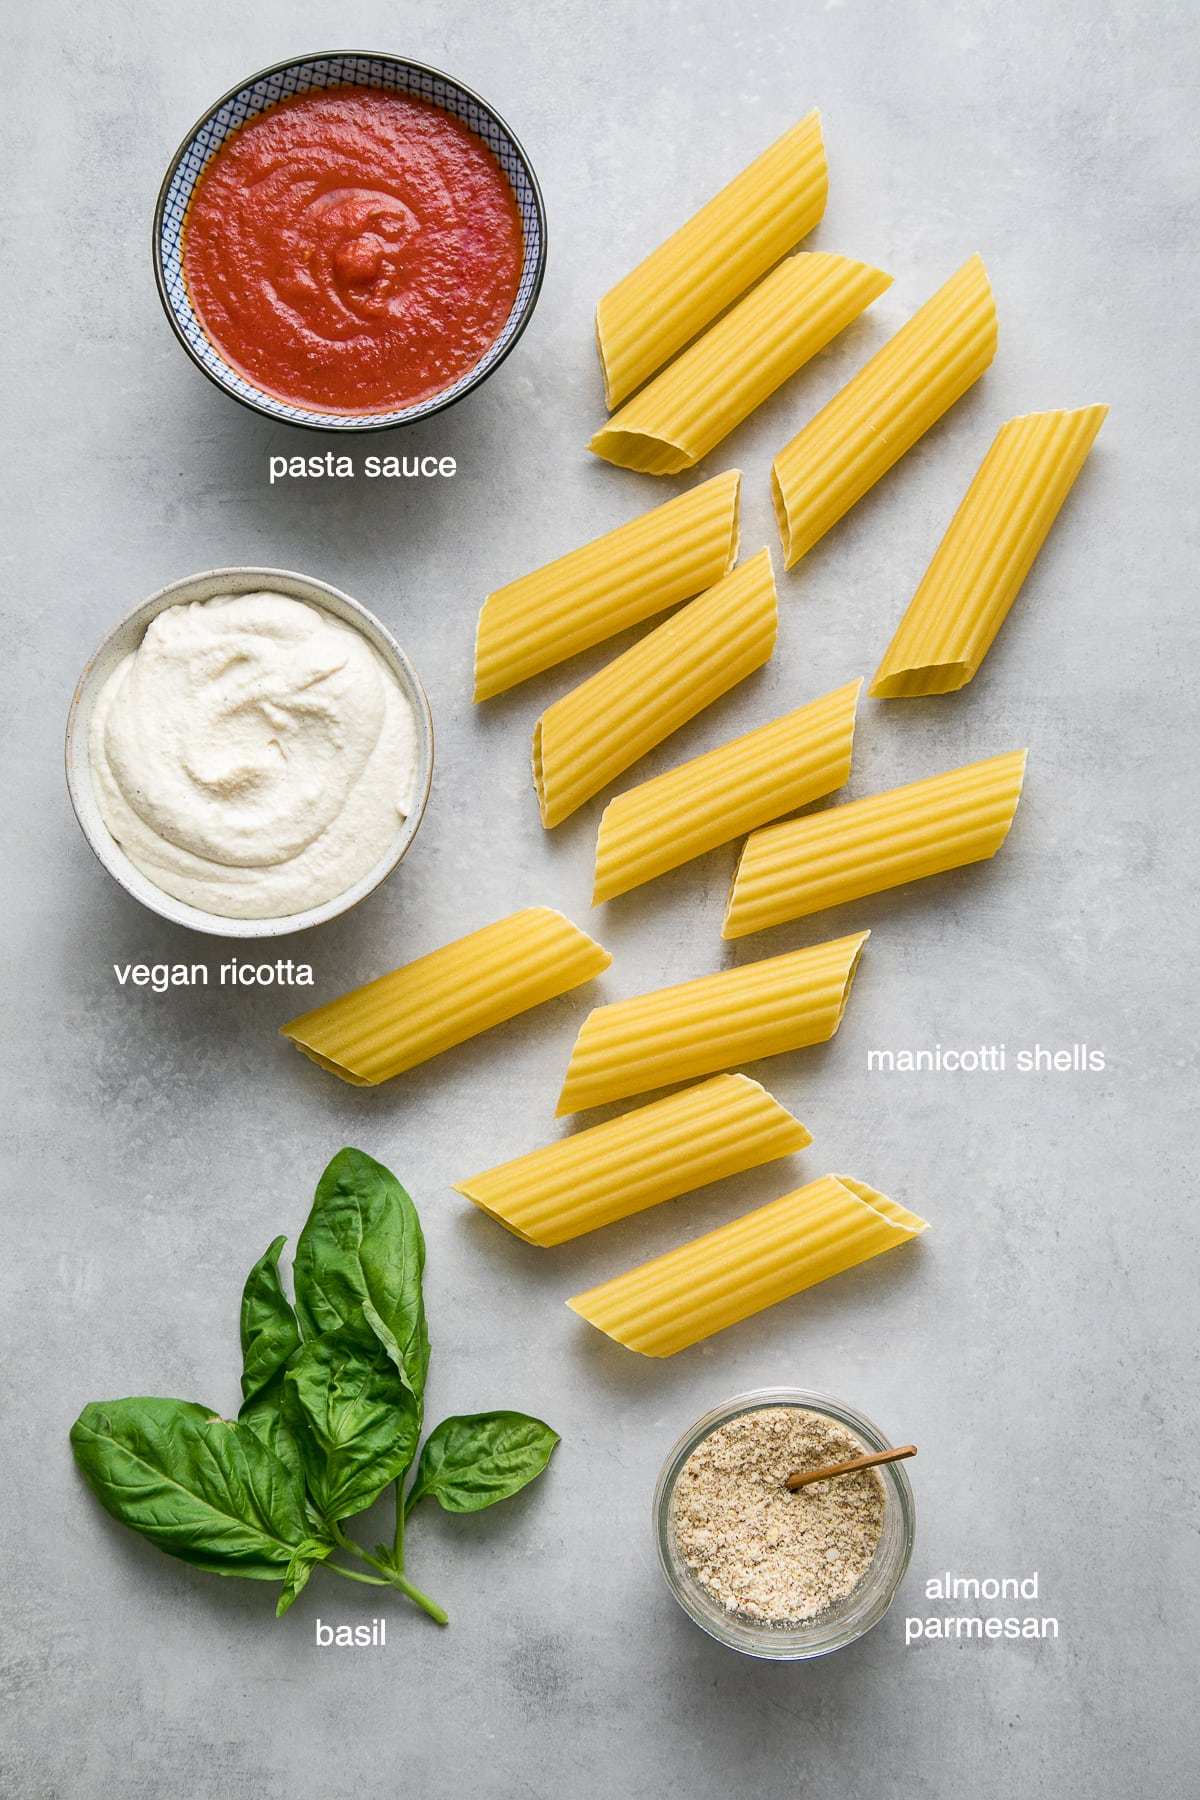 top down view of ingredients used to make vegan manicotti pasta recipe.